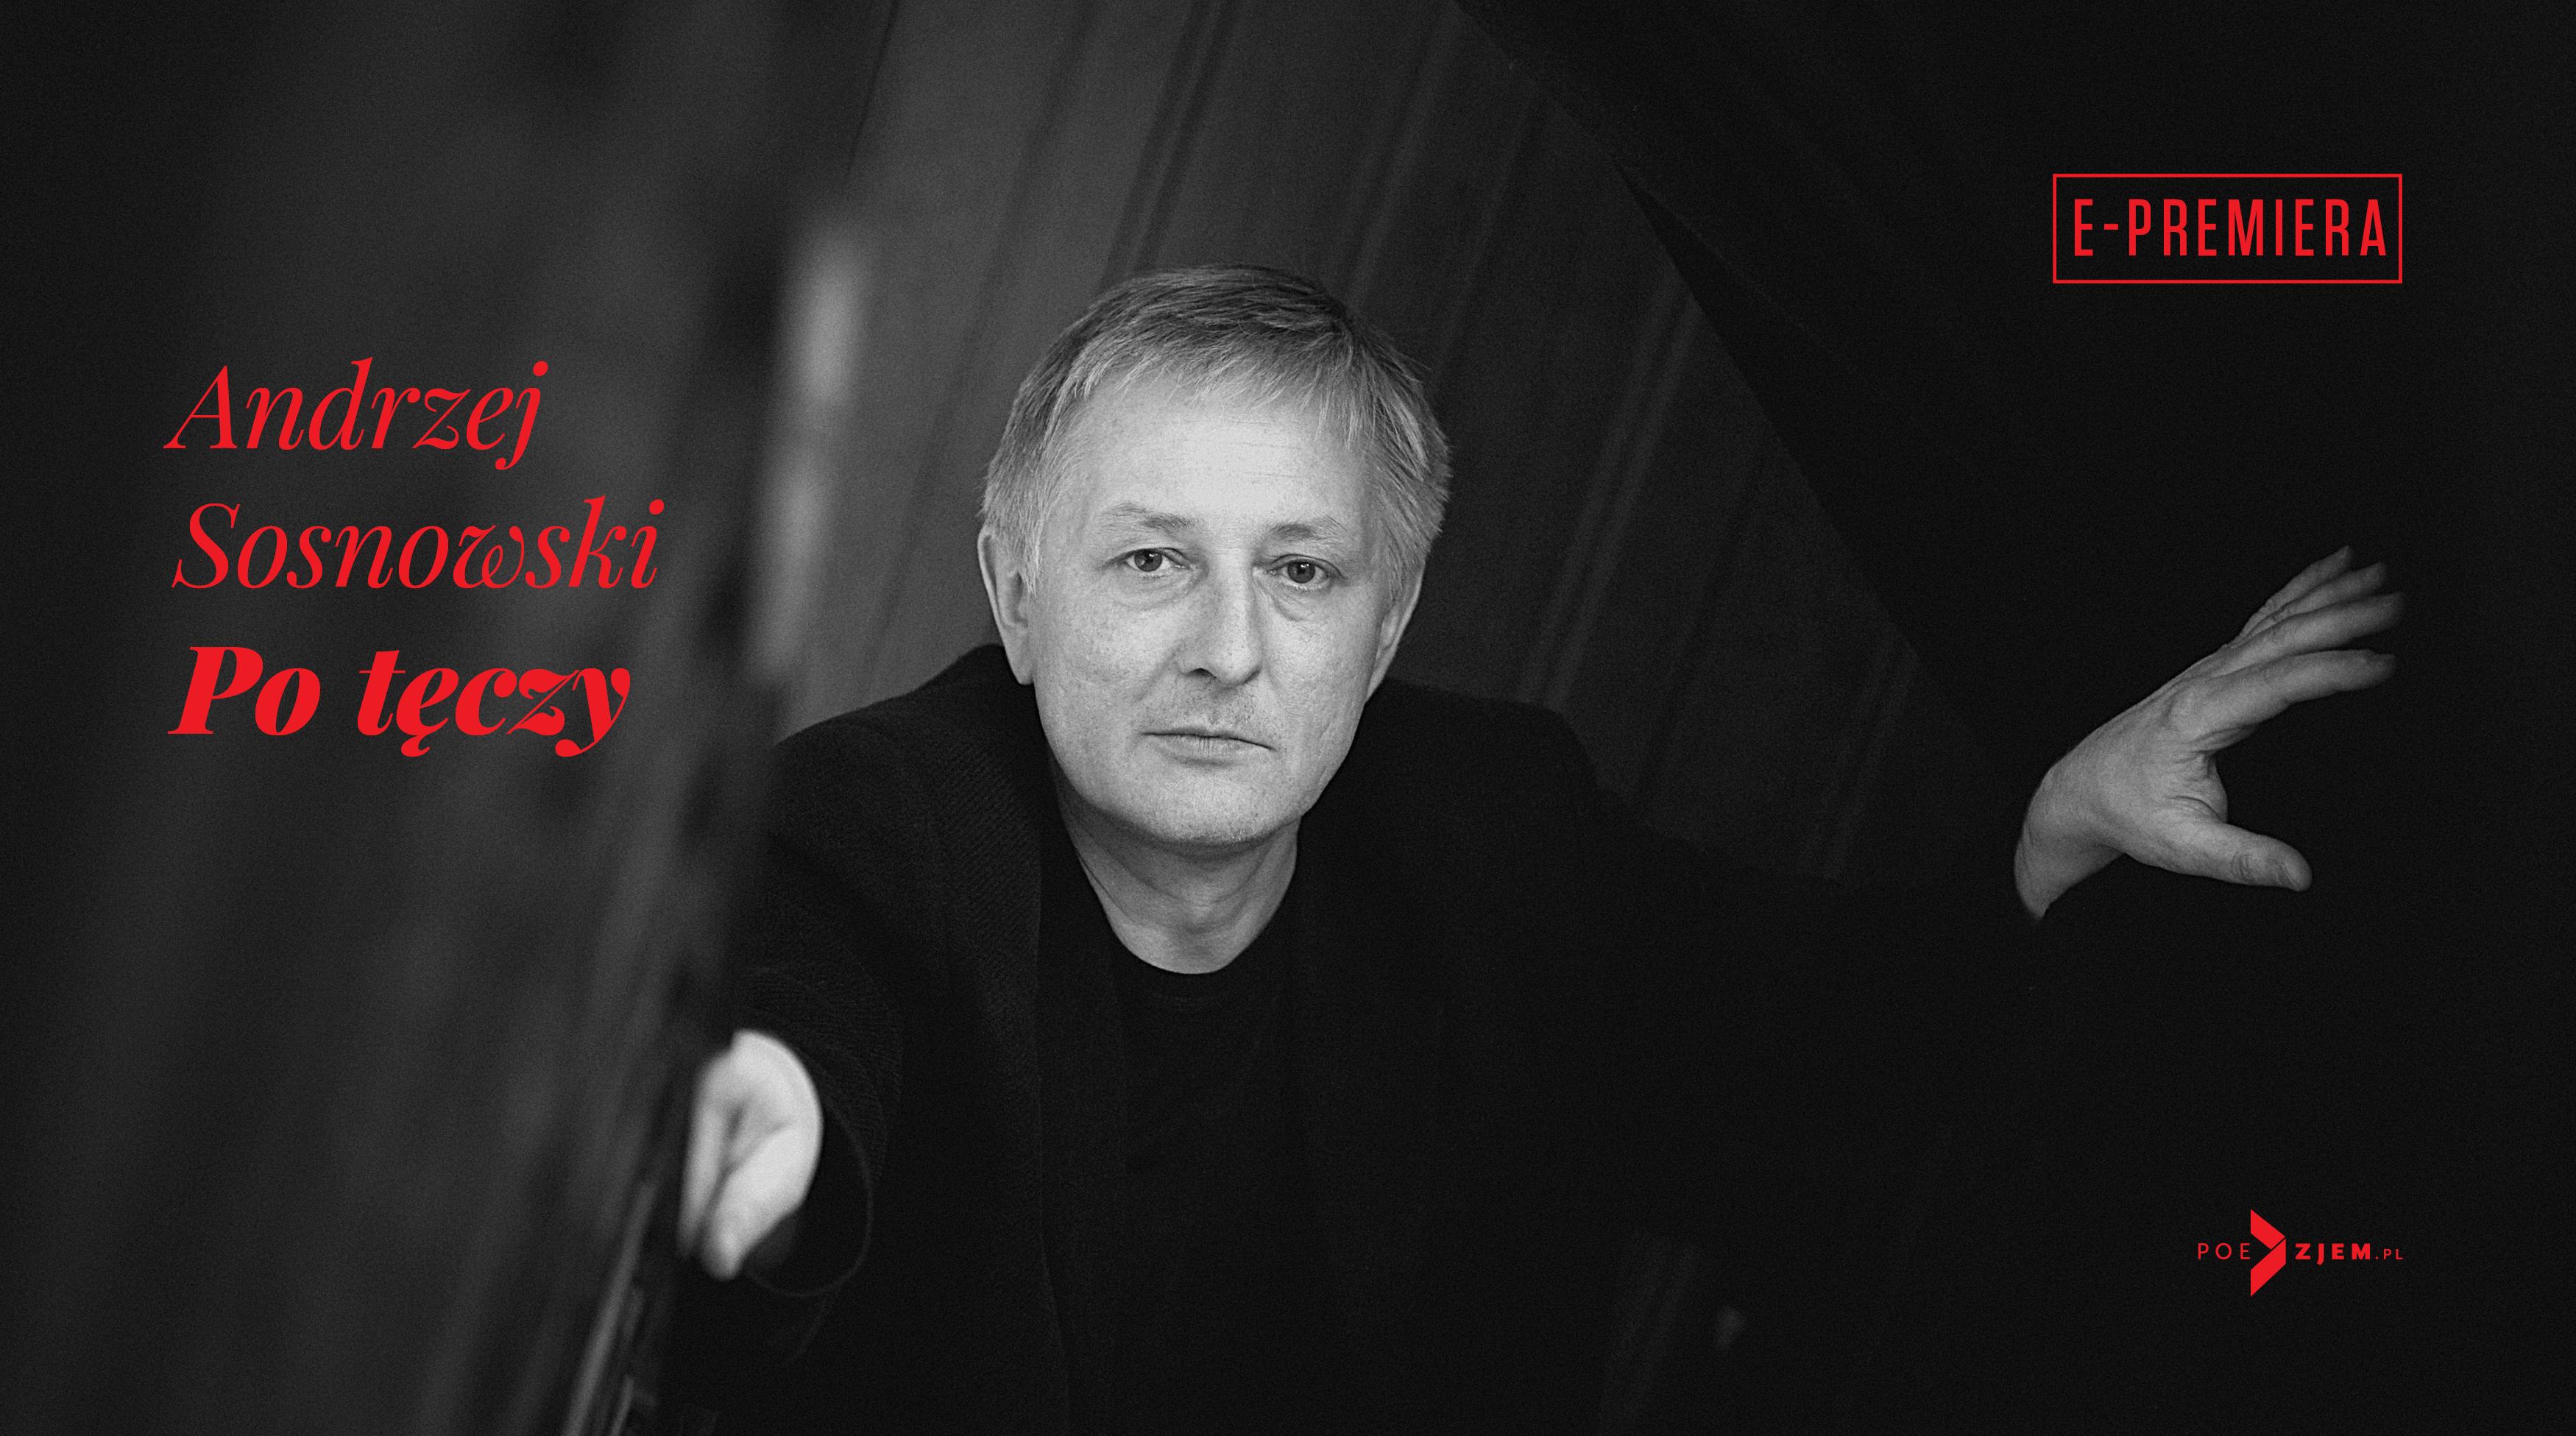 BL Img 2018.02.14 Poezja z nagrodami Po tęczy__top